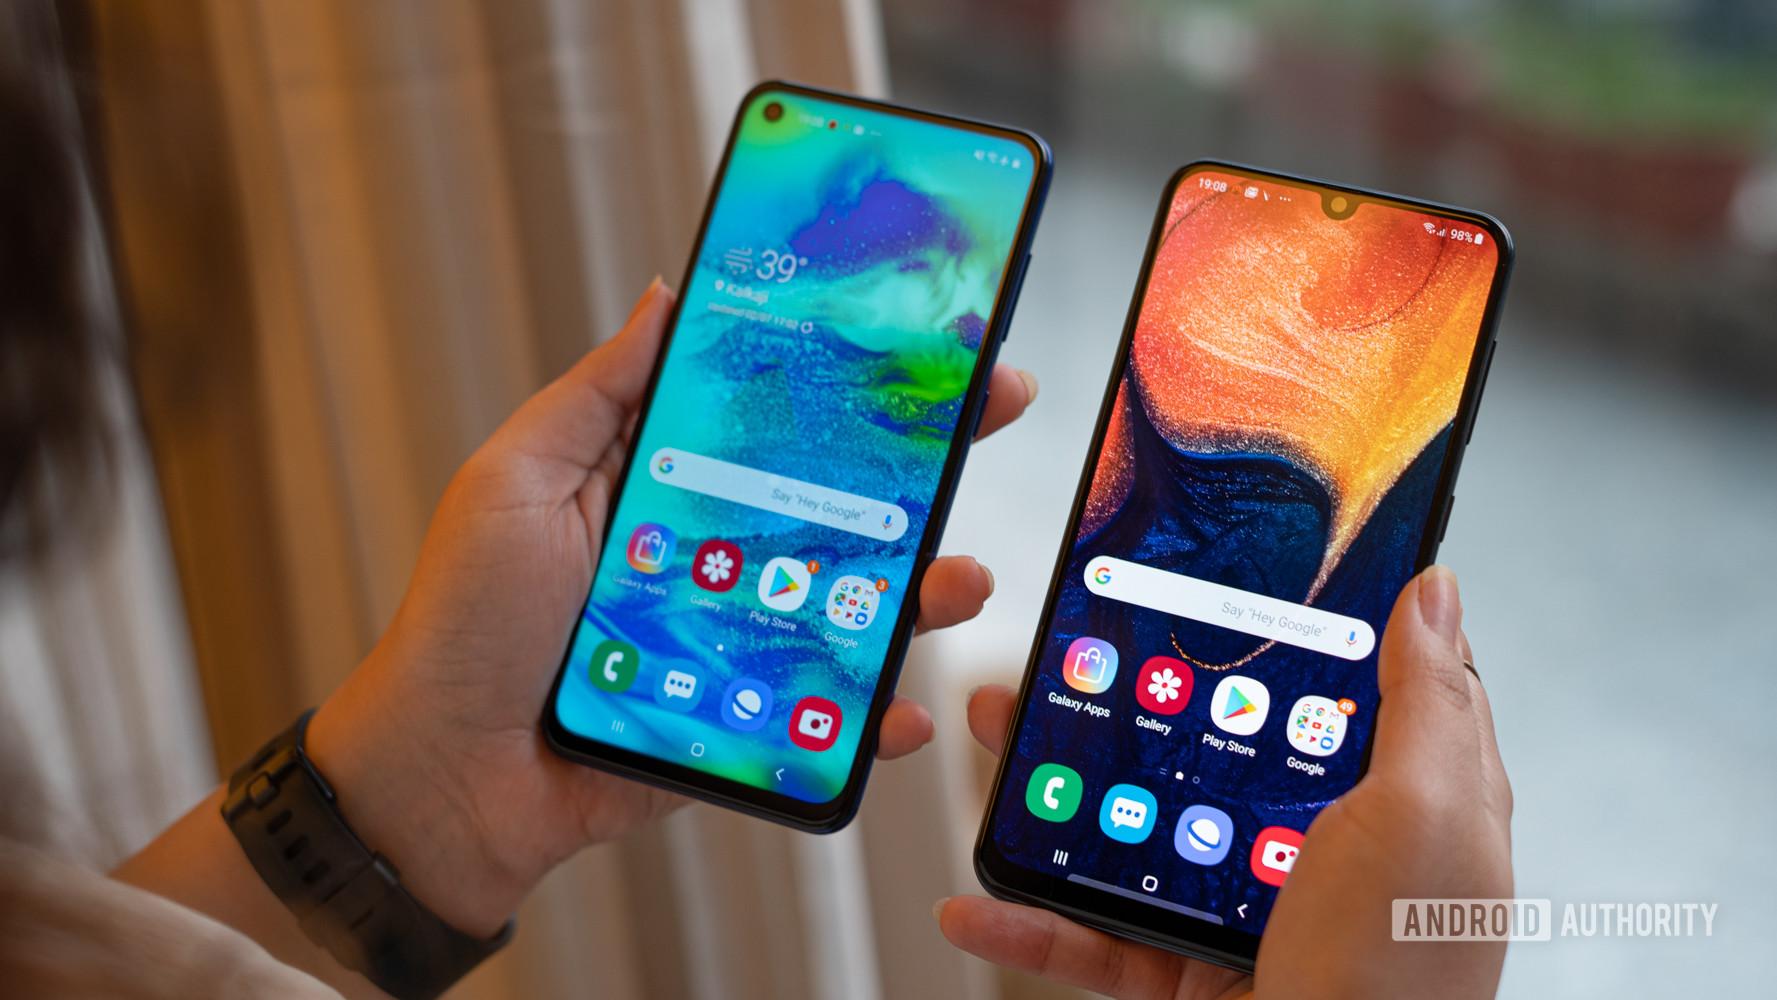 Samsung Galaxy M40 vs Galaxy A50 cameras and notch in hand